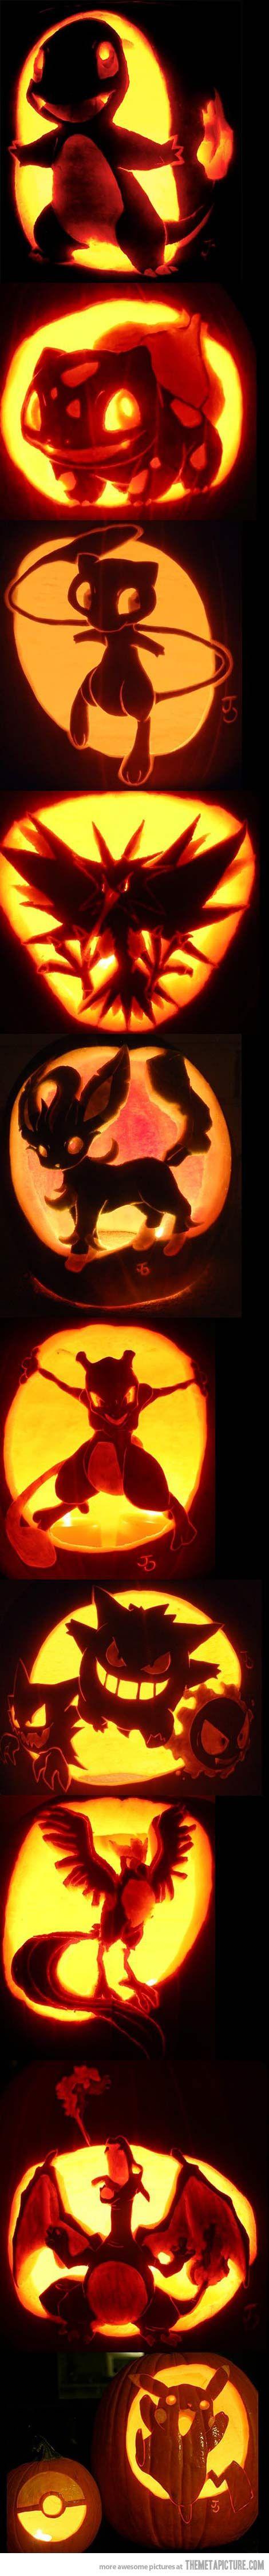 Halloween Pokémon Pumpkin Designs